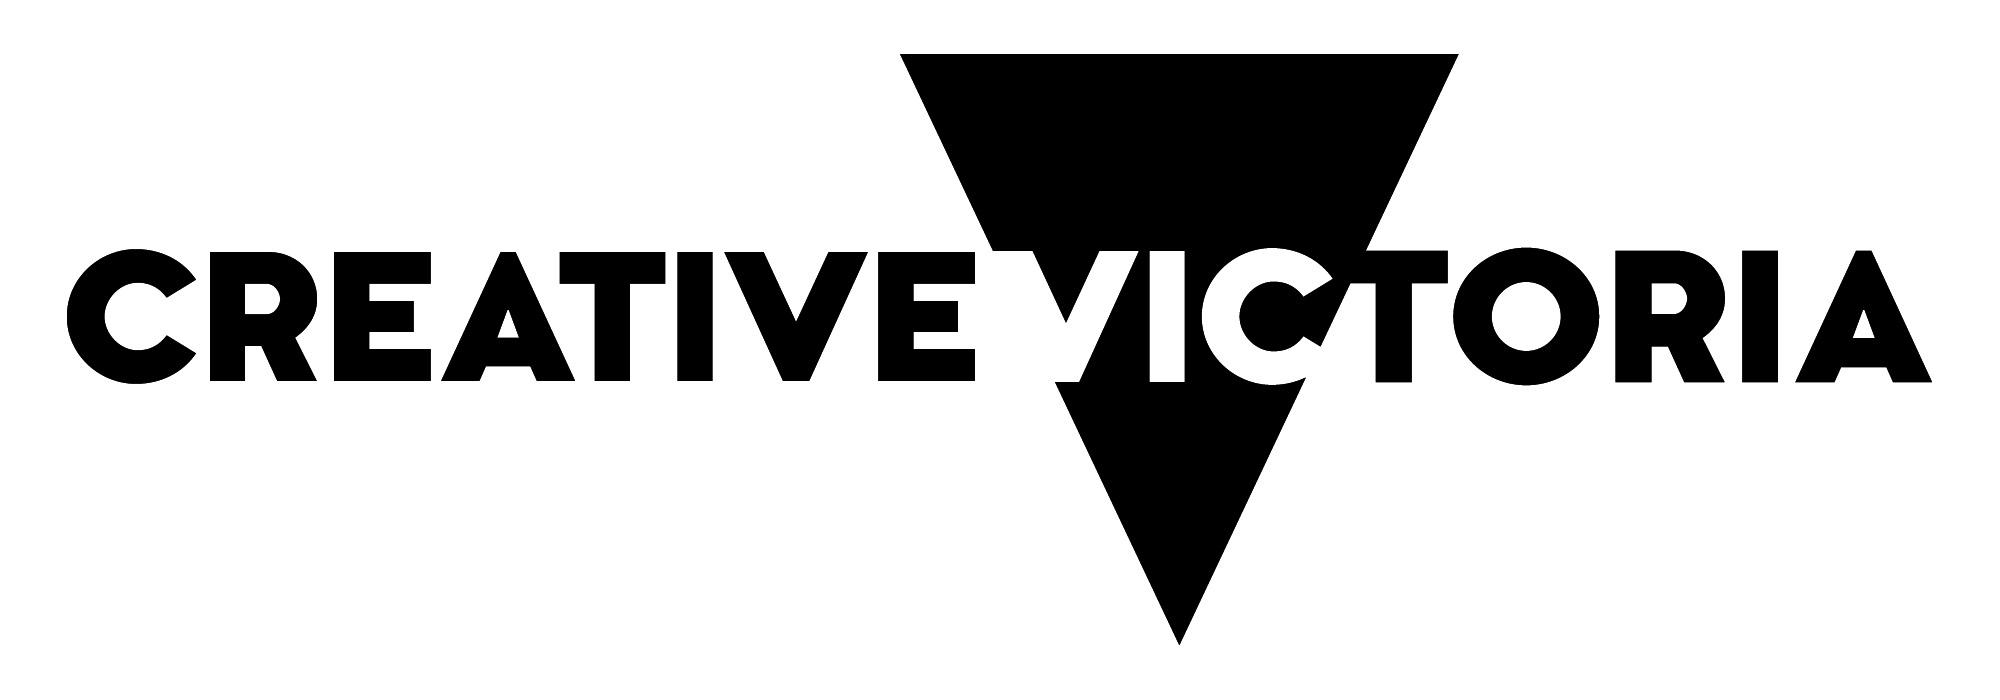 CreativeVictoria_logo-print.jpg